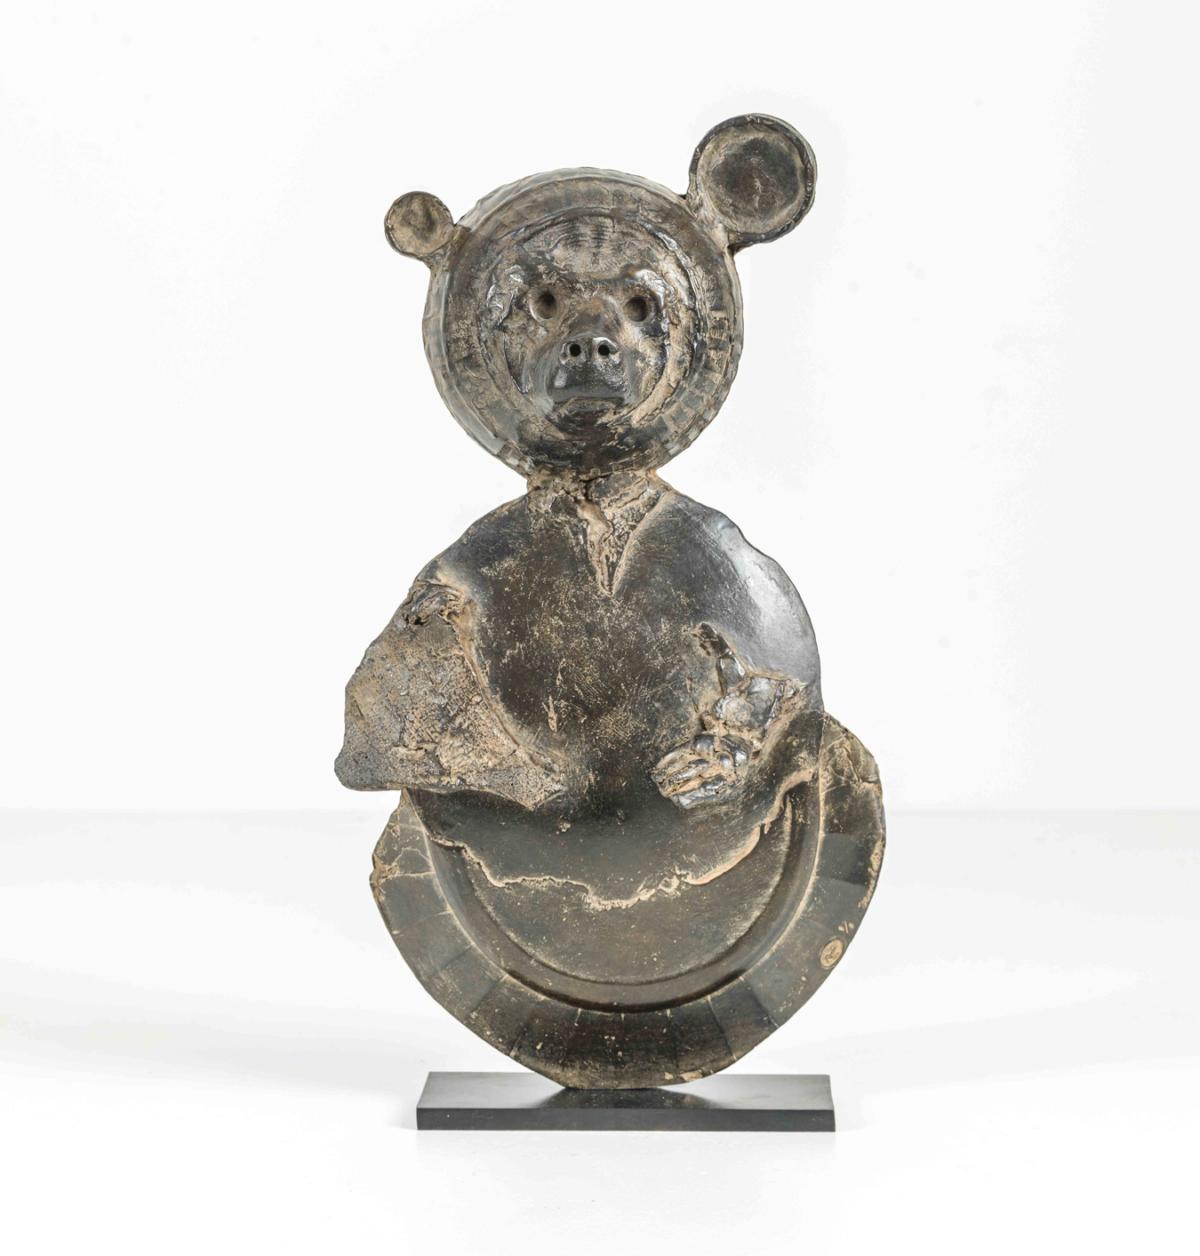 Ours Bronze 47 x 20 x 8 cm, DP008 ©Denis Polge